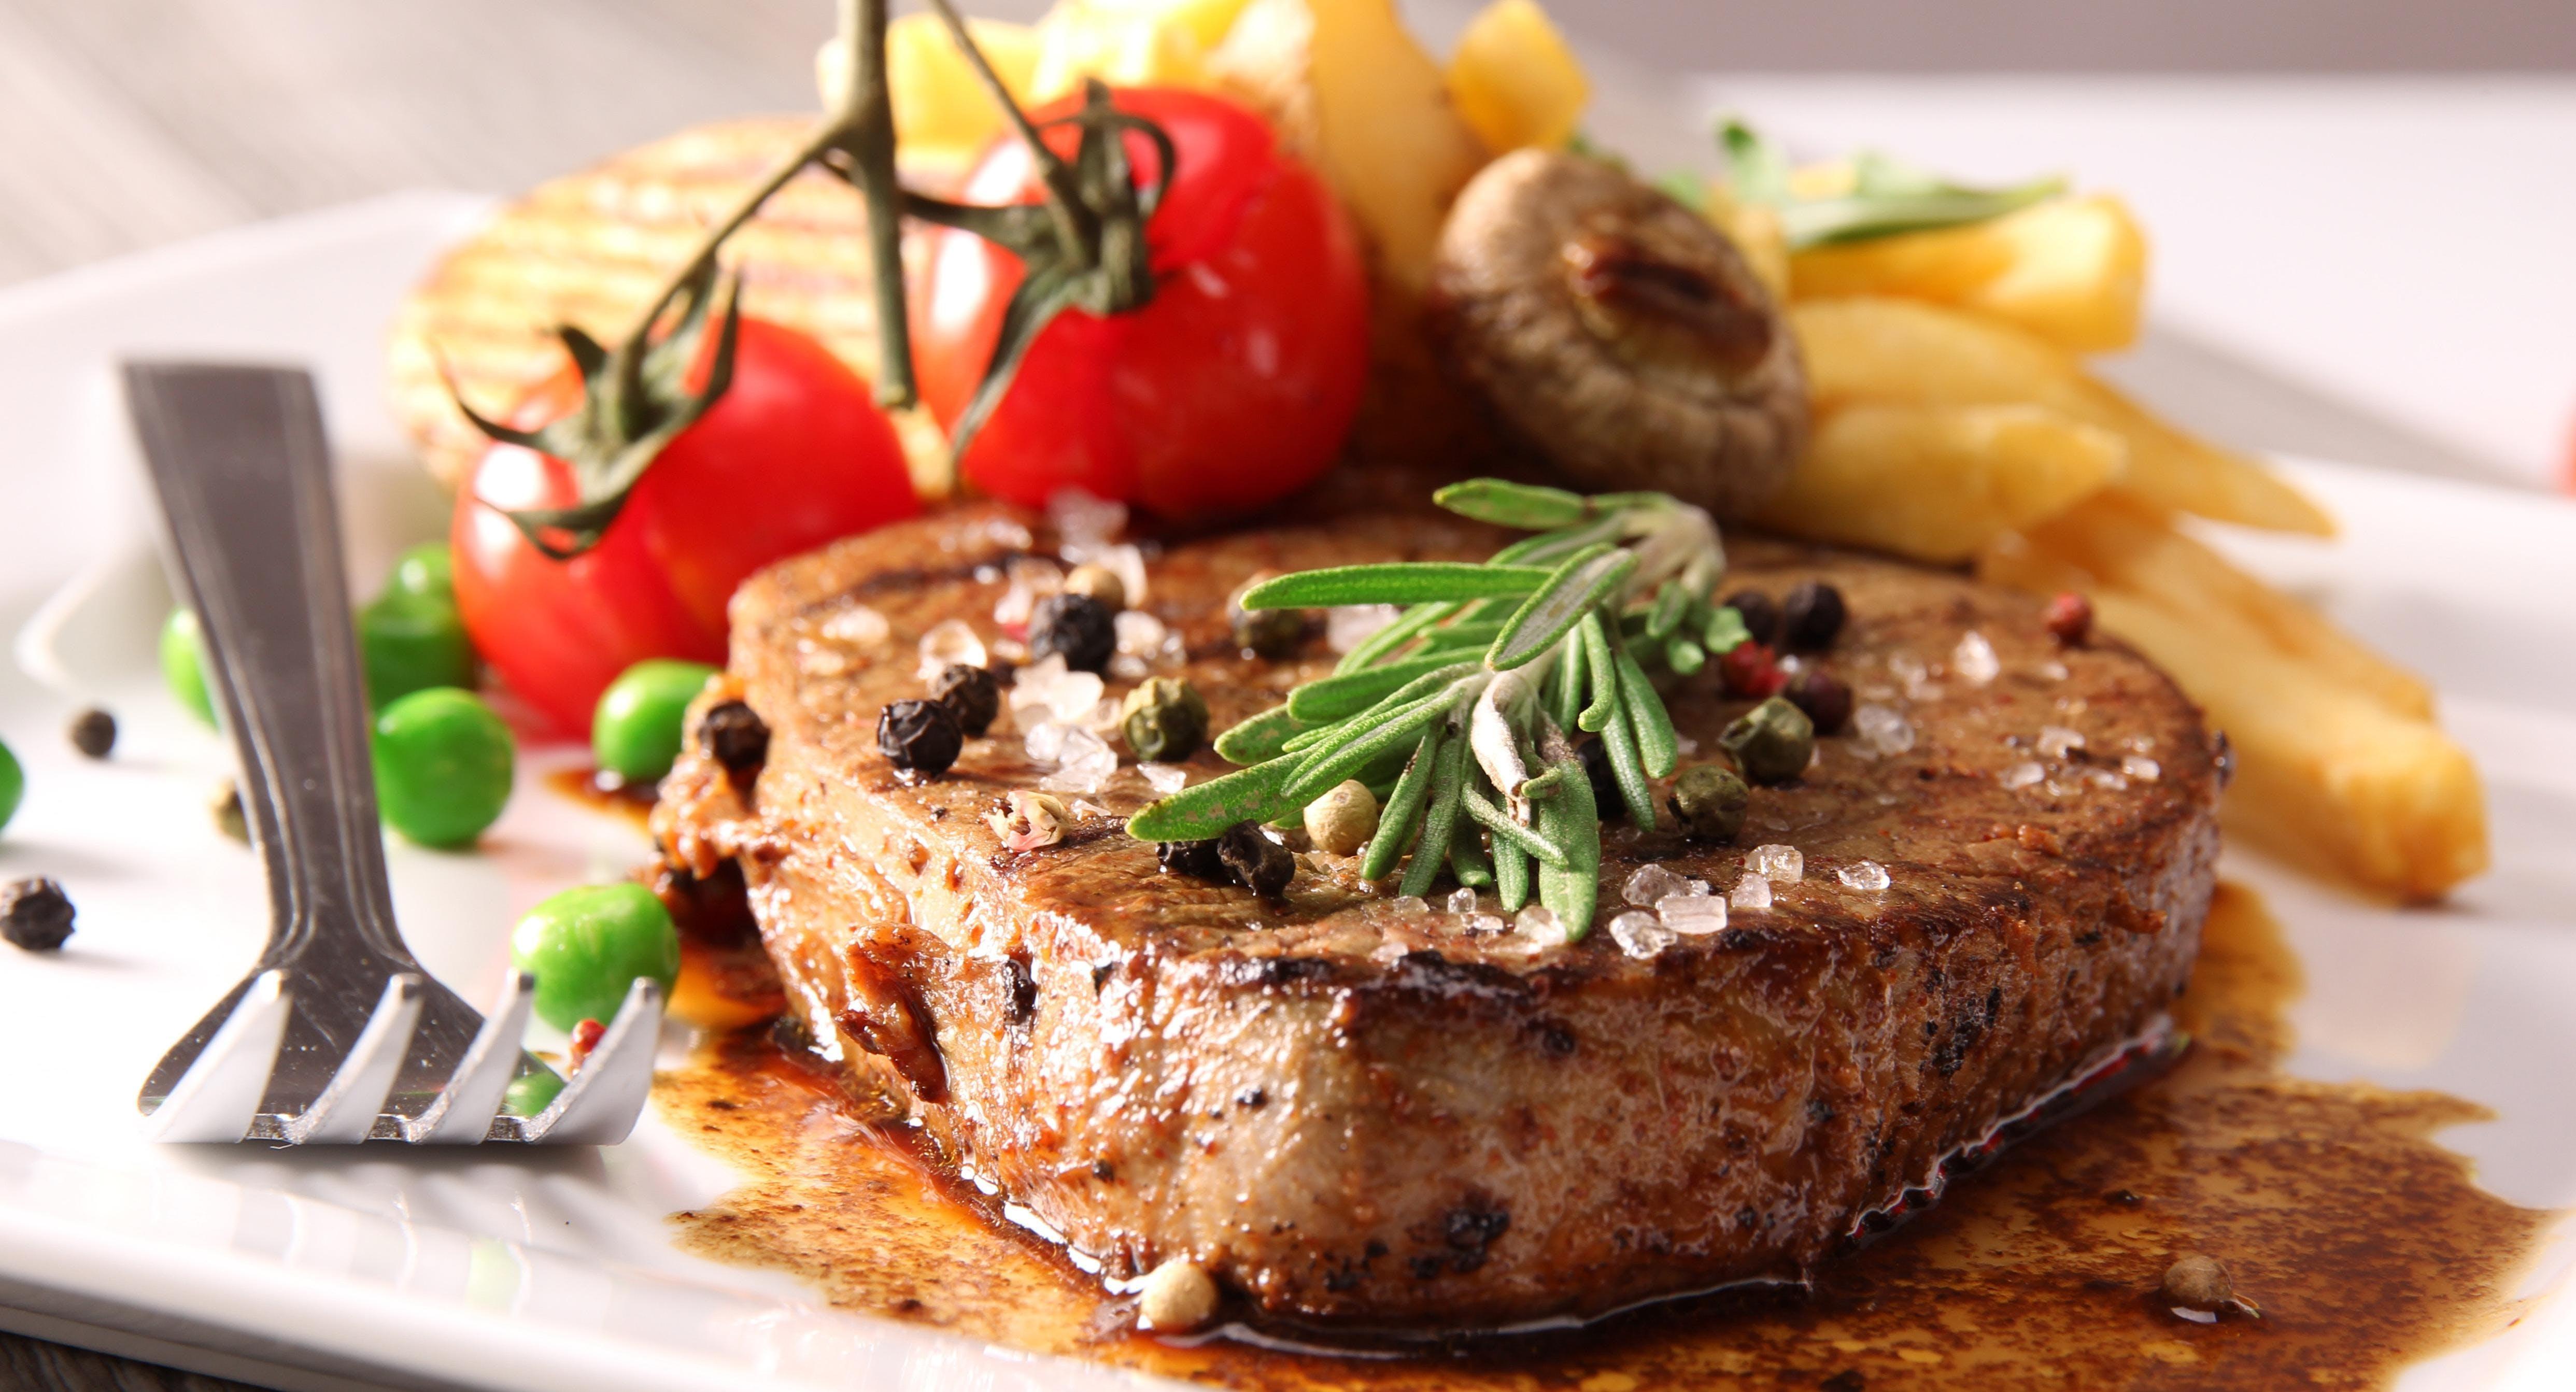 Tunici Restaurants Hamburg image 1